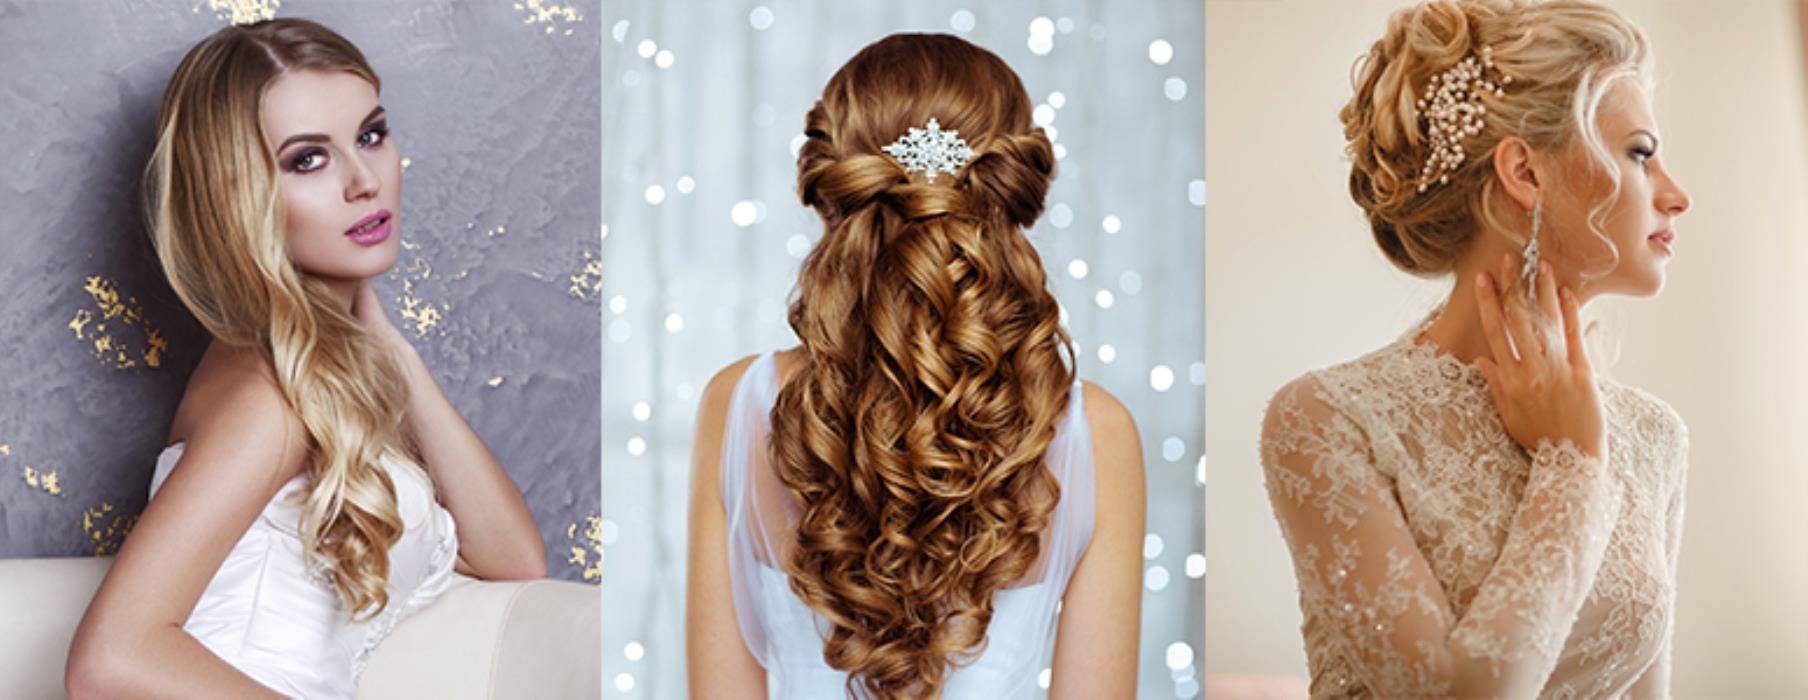 Super Tendenze 2015 acconciature da sposa | Clara Couture CG87